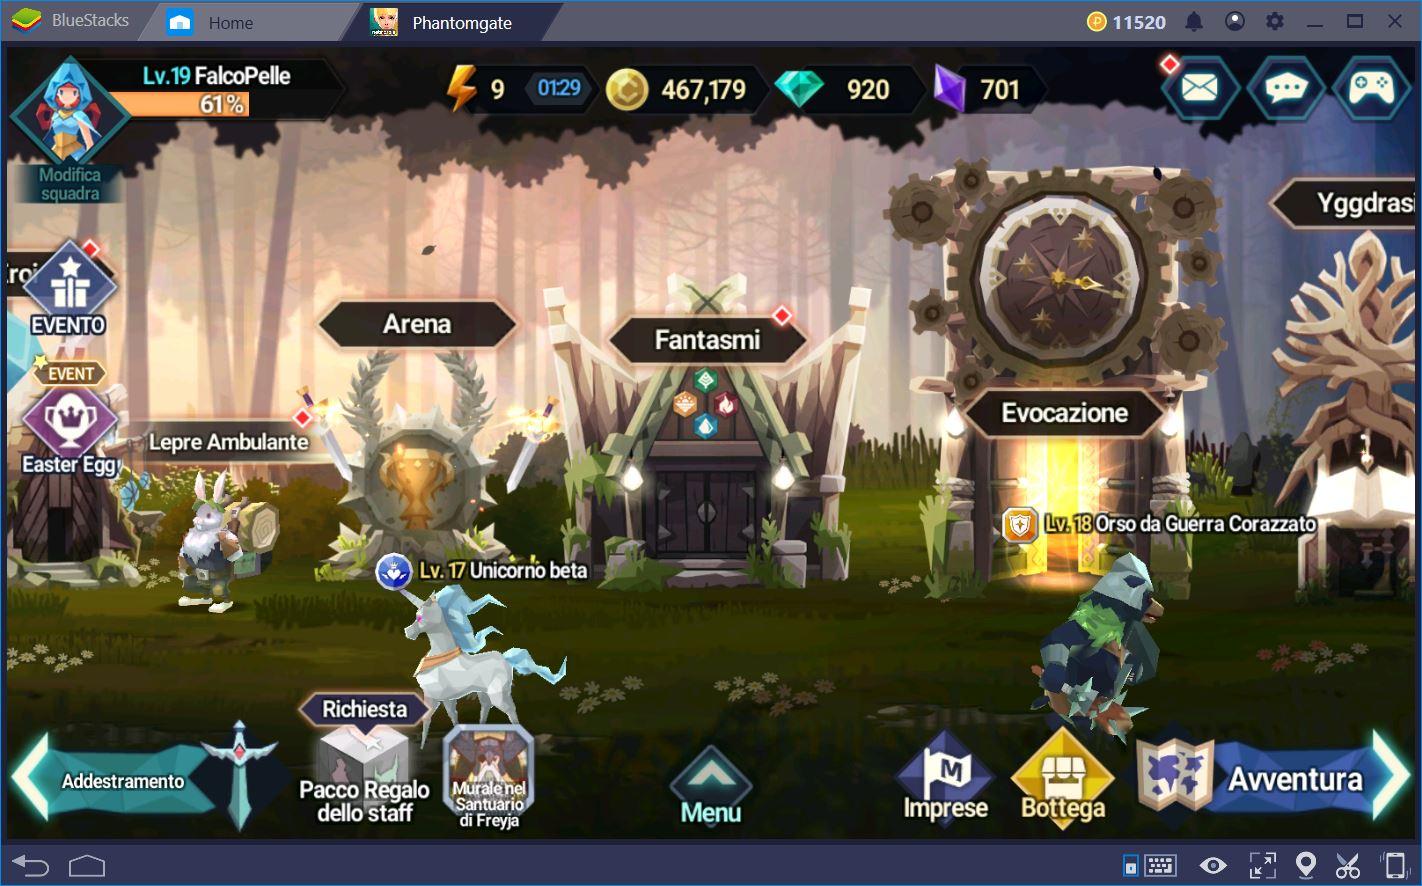 Phantomgate: La Guida per i Nuovi Giocatori